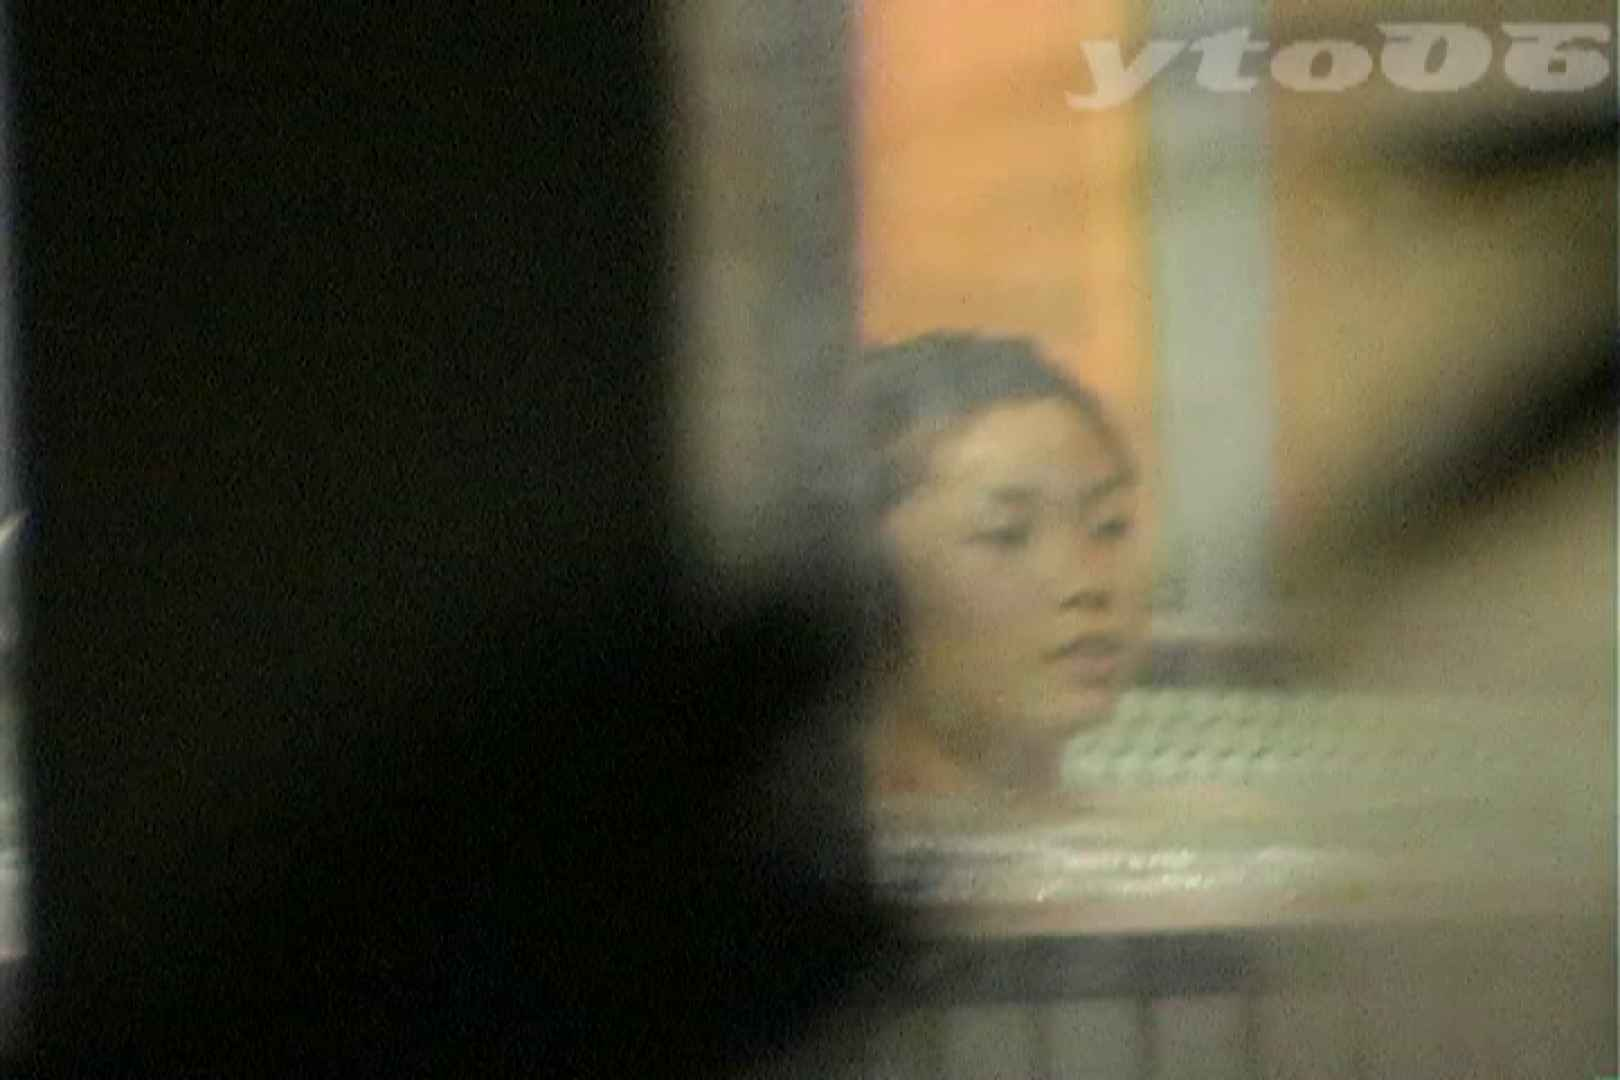 ▲復活限定▲合宿ホテル女風呂盗撮 Vol.36 女風呂 セックス無修正動画無料 113画像 22